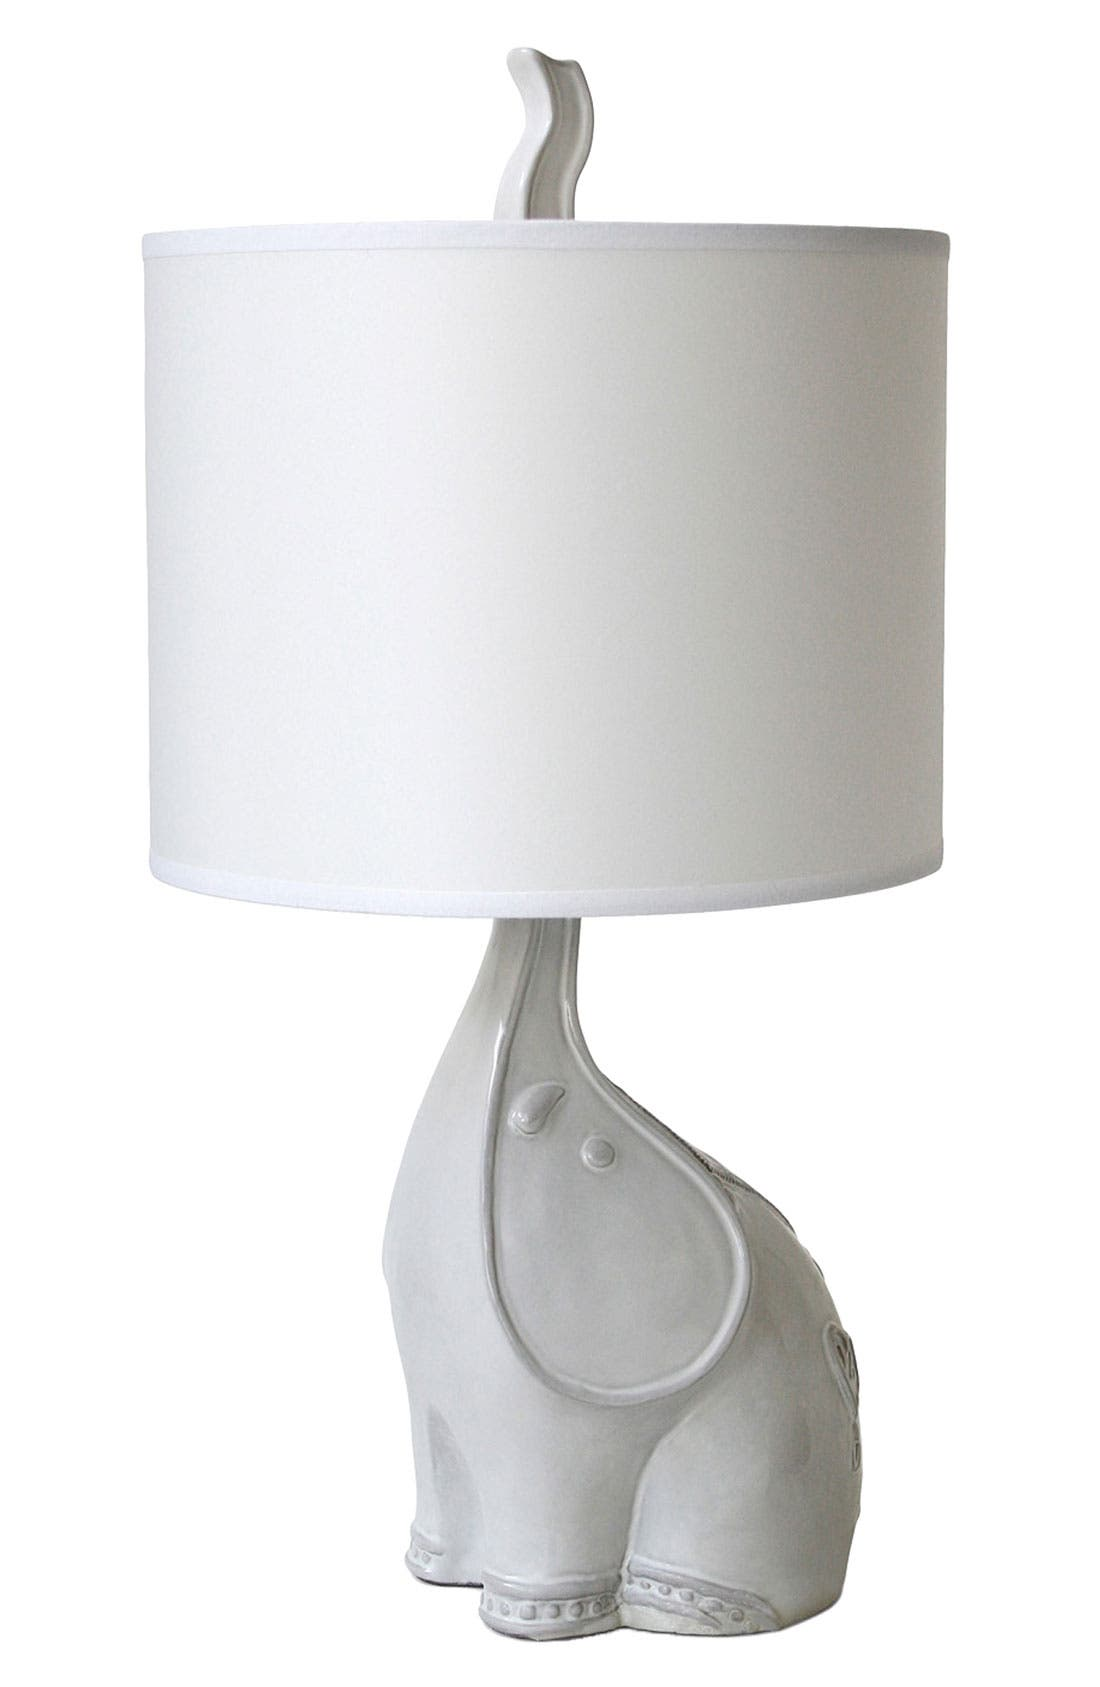 Main Image - Jonathan Adler 'Elephant' Lamp